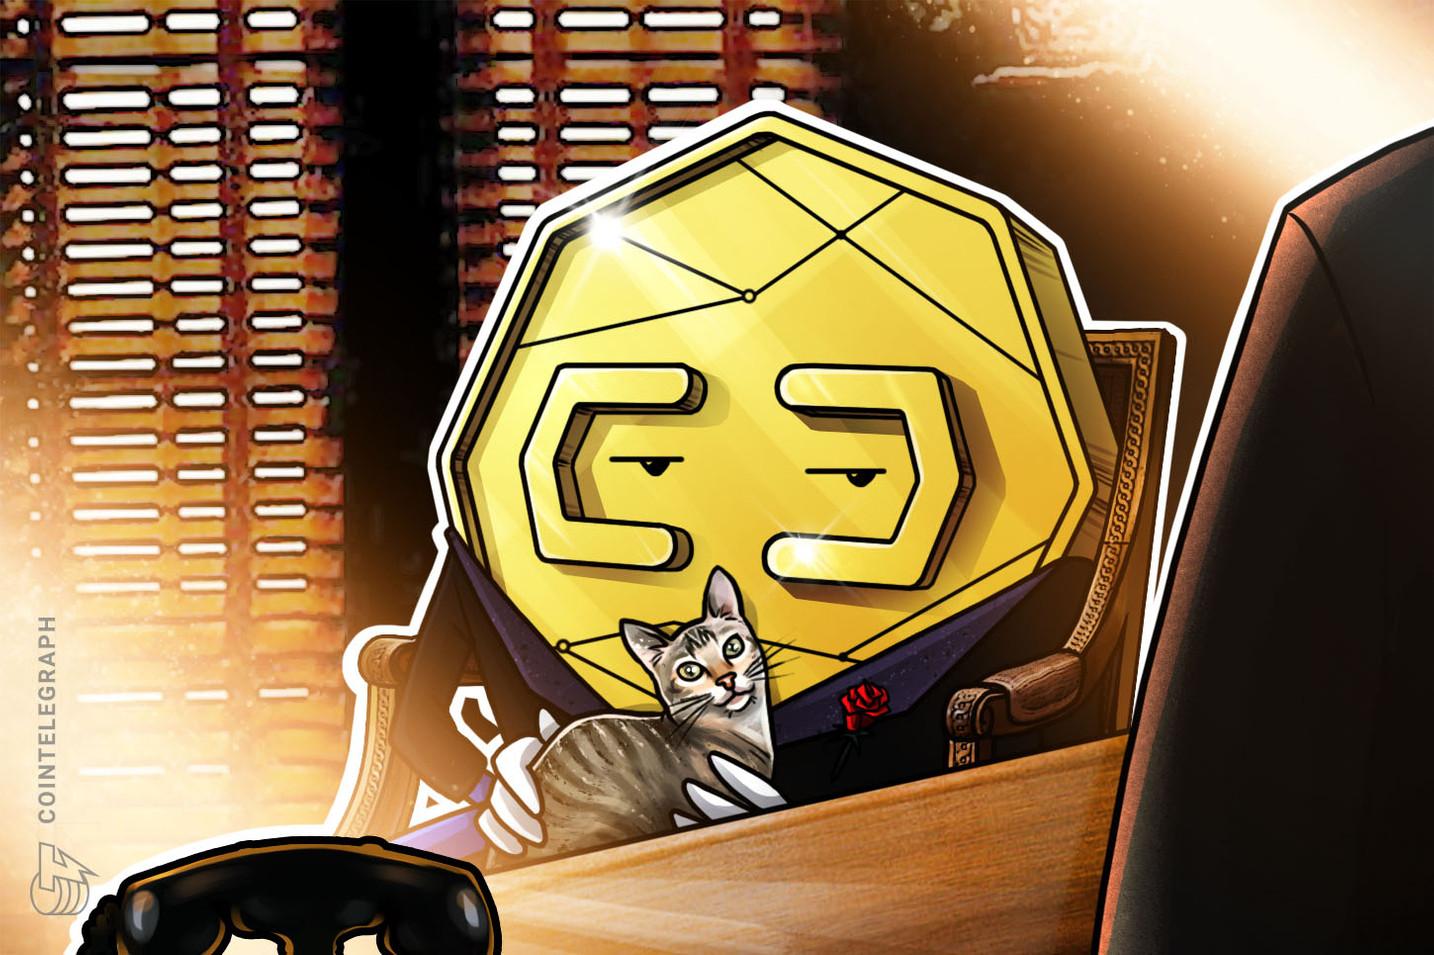 US Treasury Secretary Yellen says crypto misuse is a growing problem